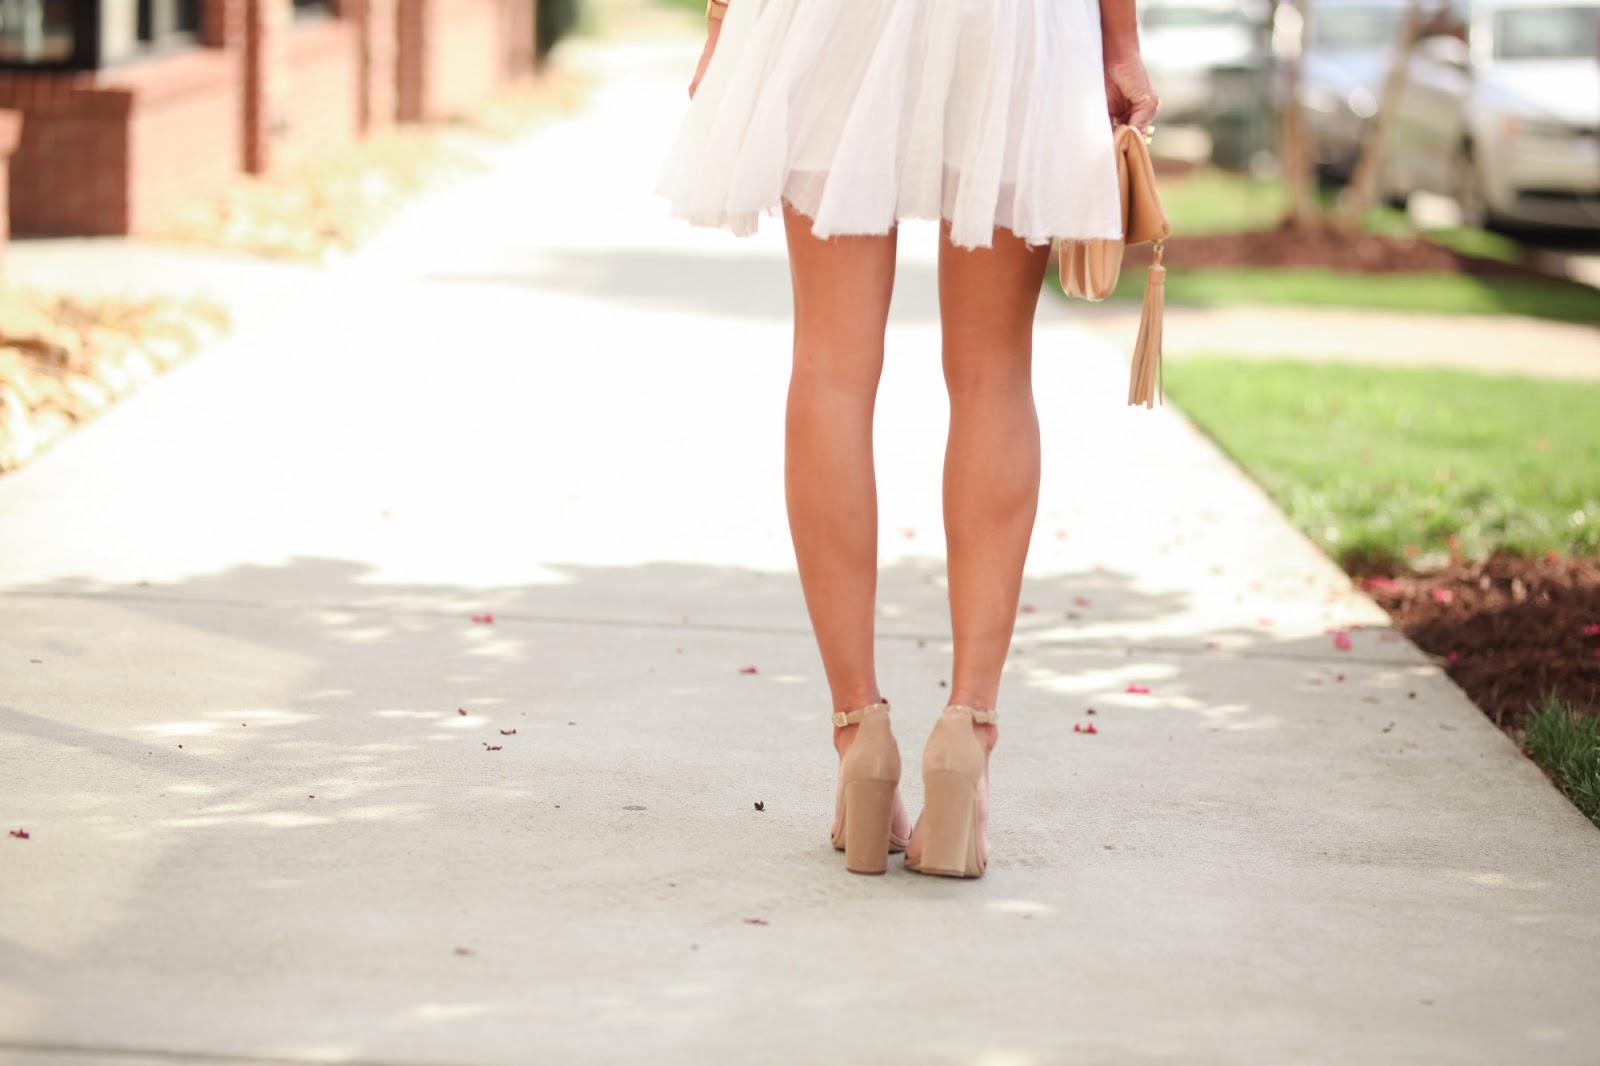 1e7391985fa4c5 Sam Edelman Yaro Ankle Strap Sandals    Free People Lace Mini Dress     Kendra Scott Kirsten Earrings    Brown Clutch